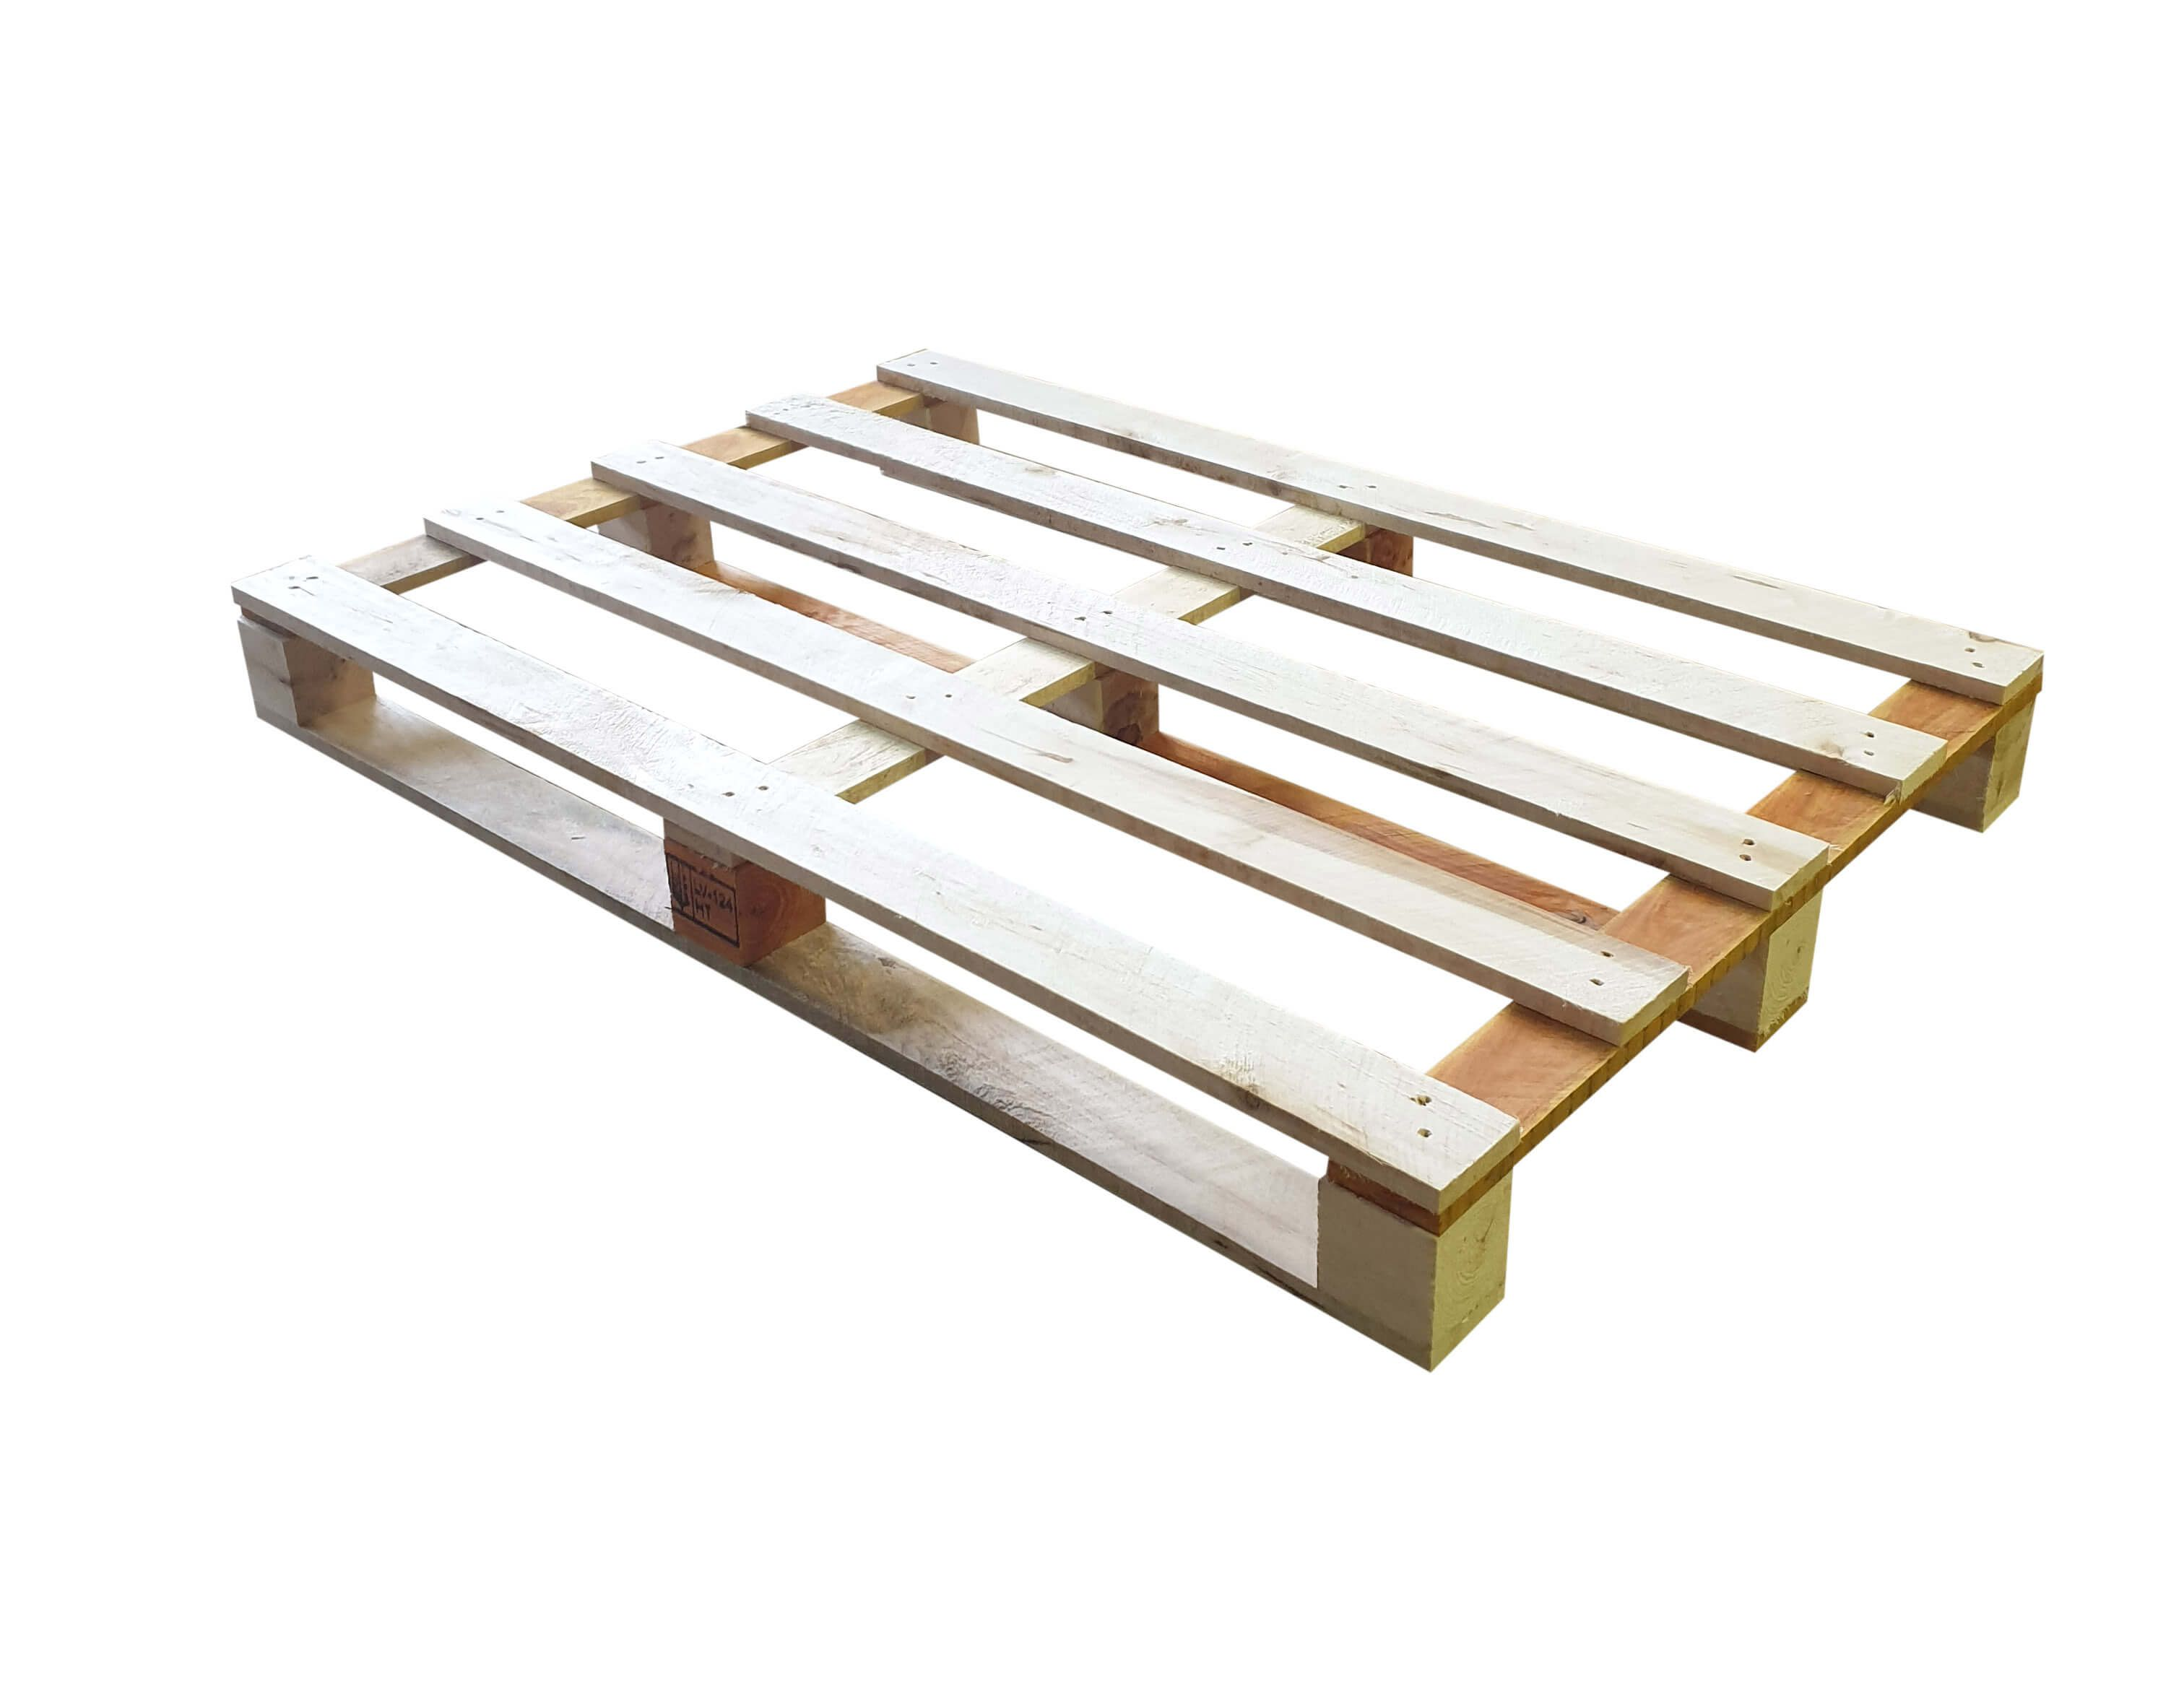 New Wooden Pallets - Pallets For Sale   Pallet ...